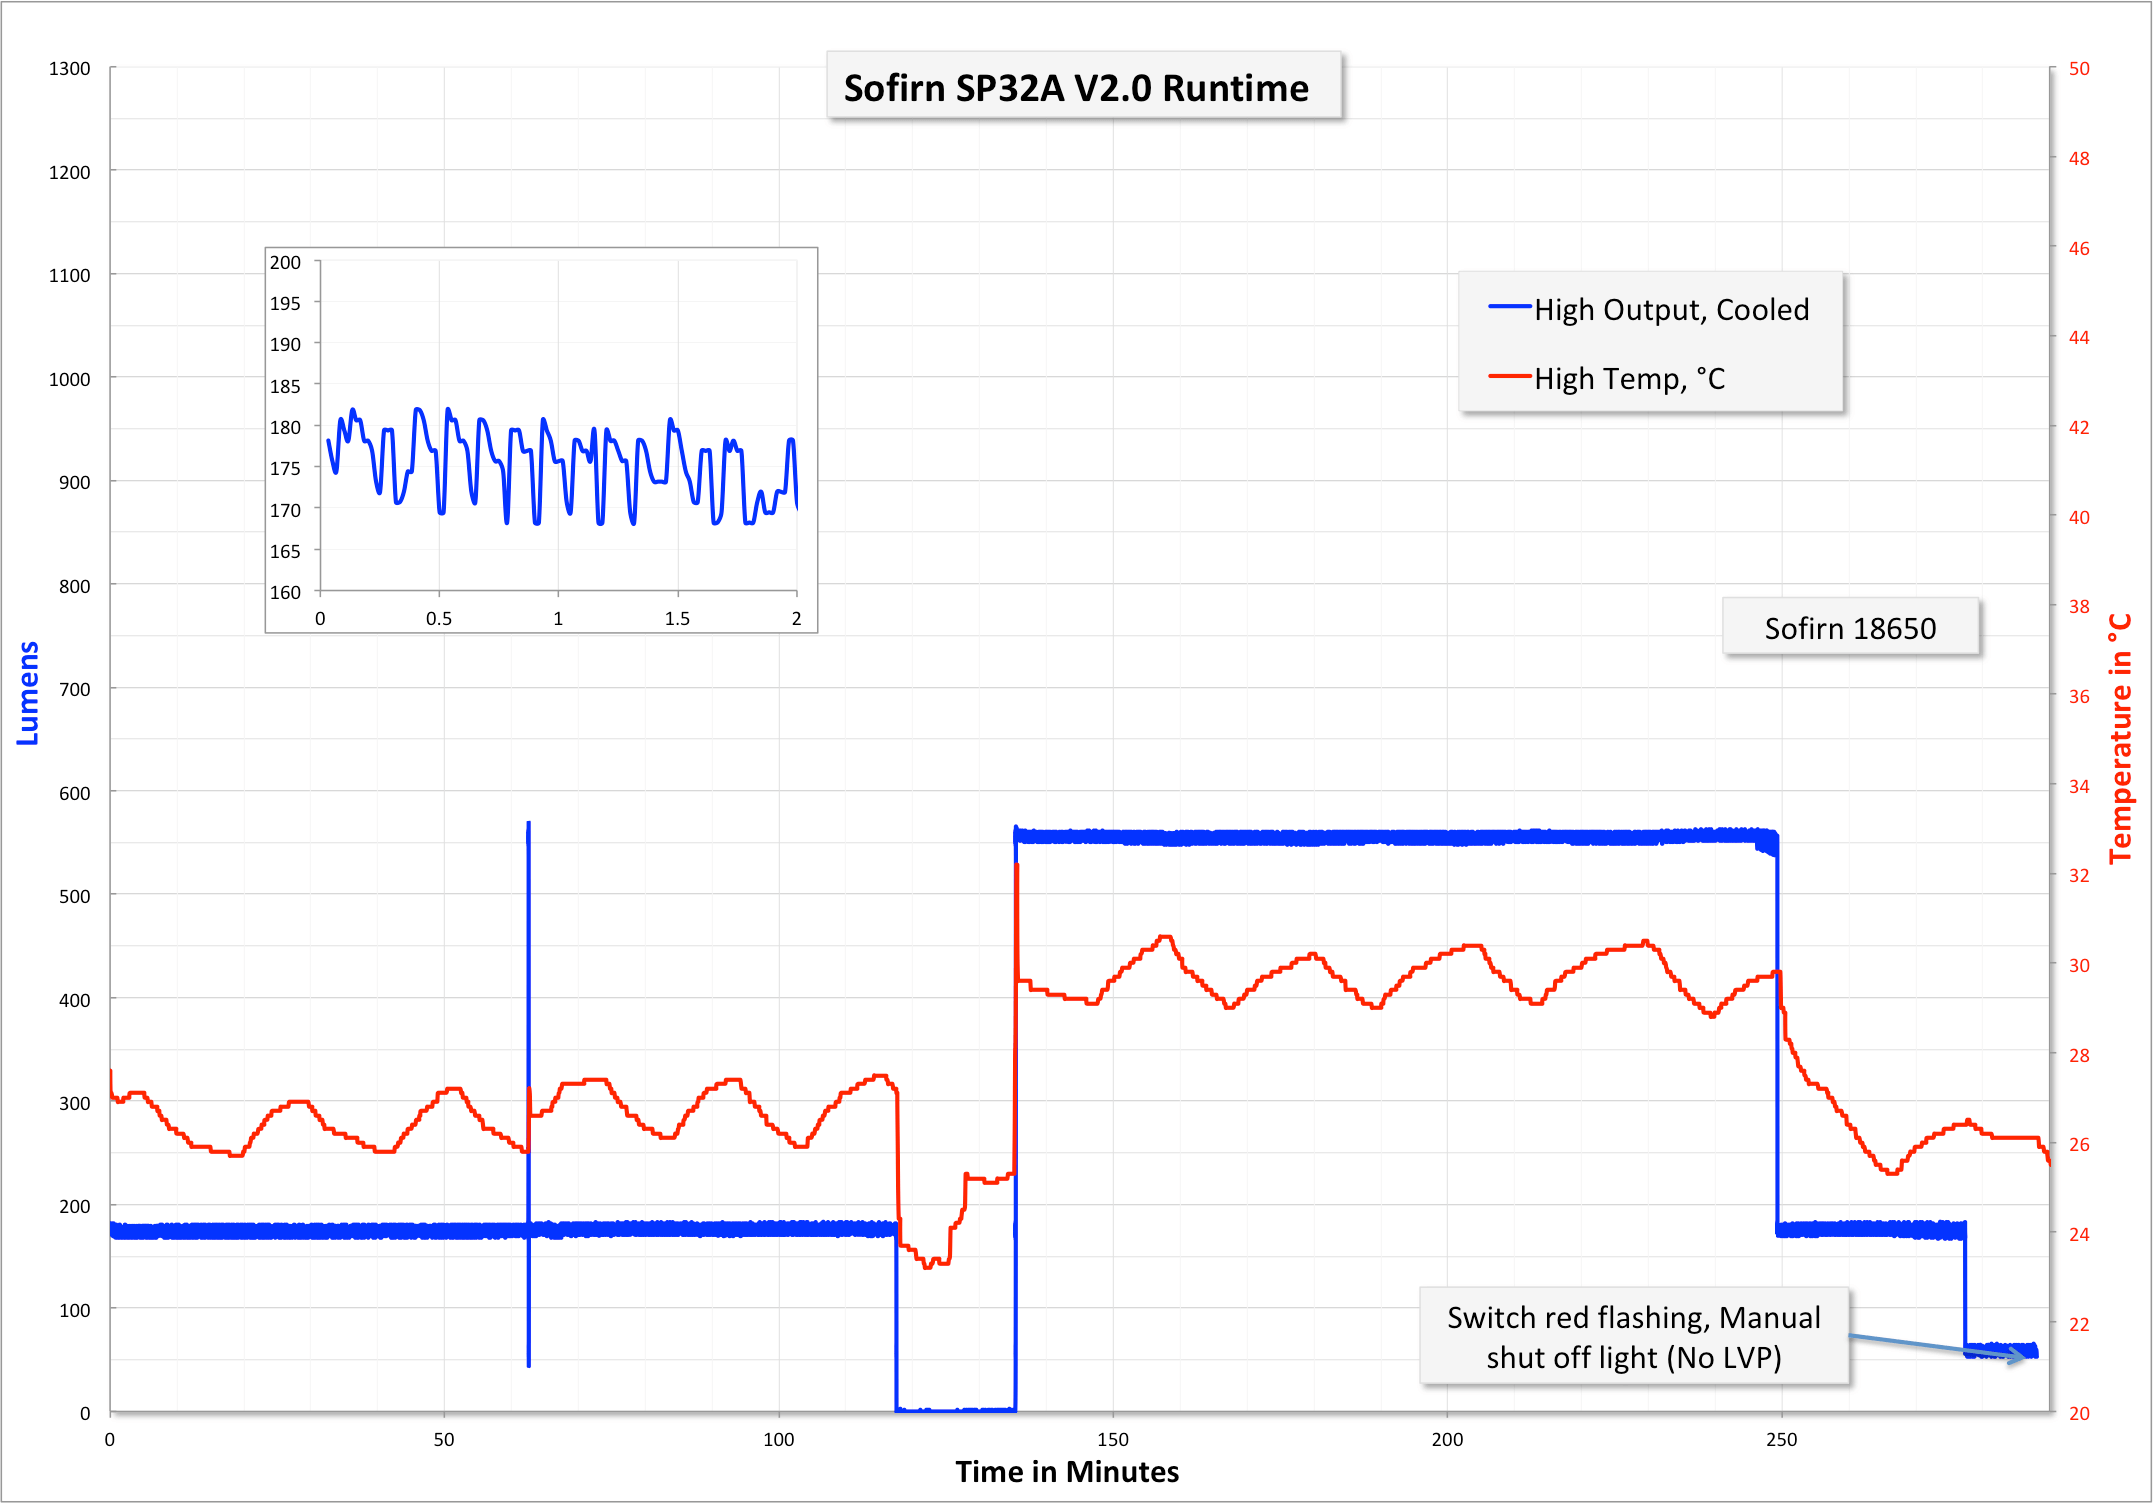 zeroair_sofirn_sp23a_v2-33.png